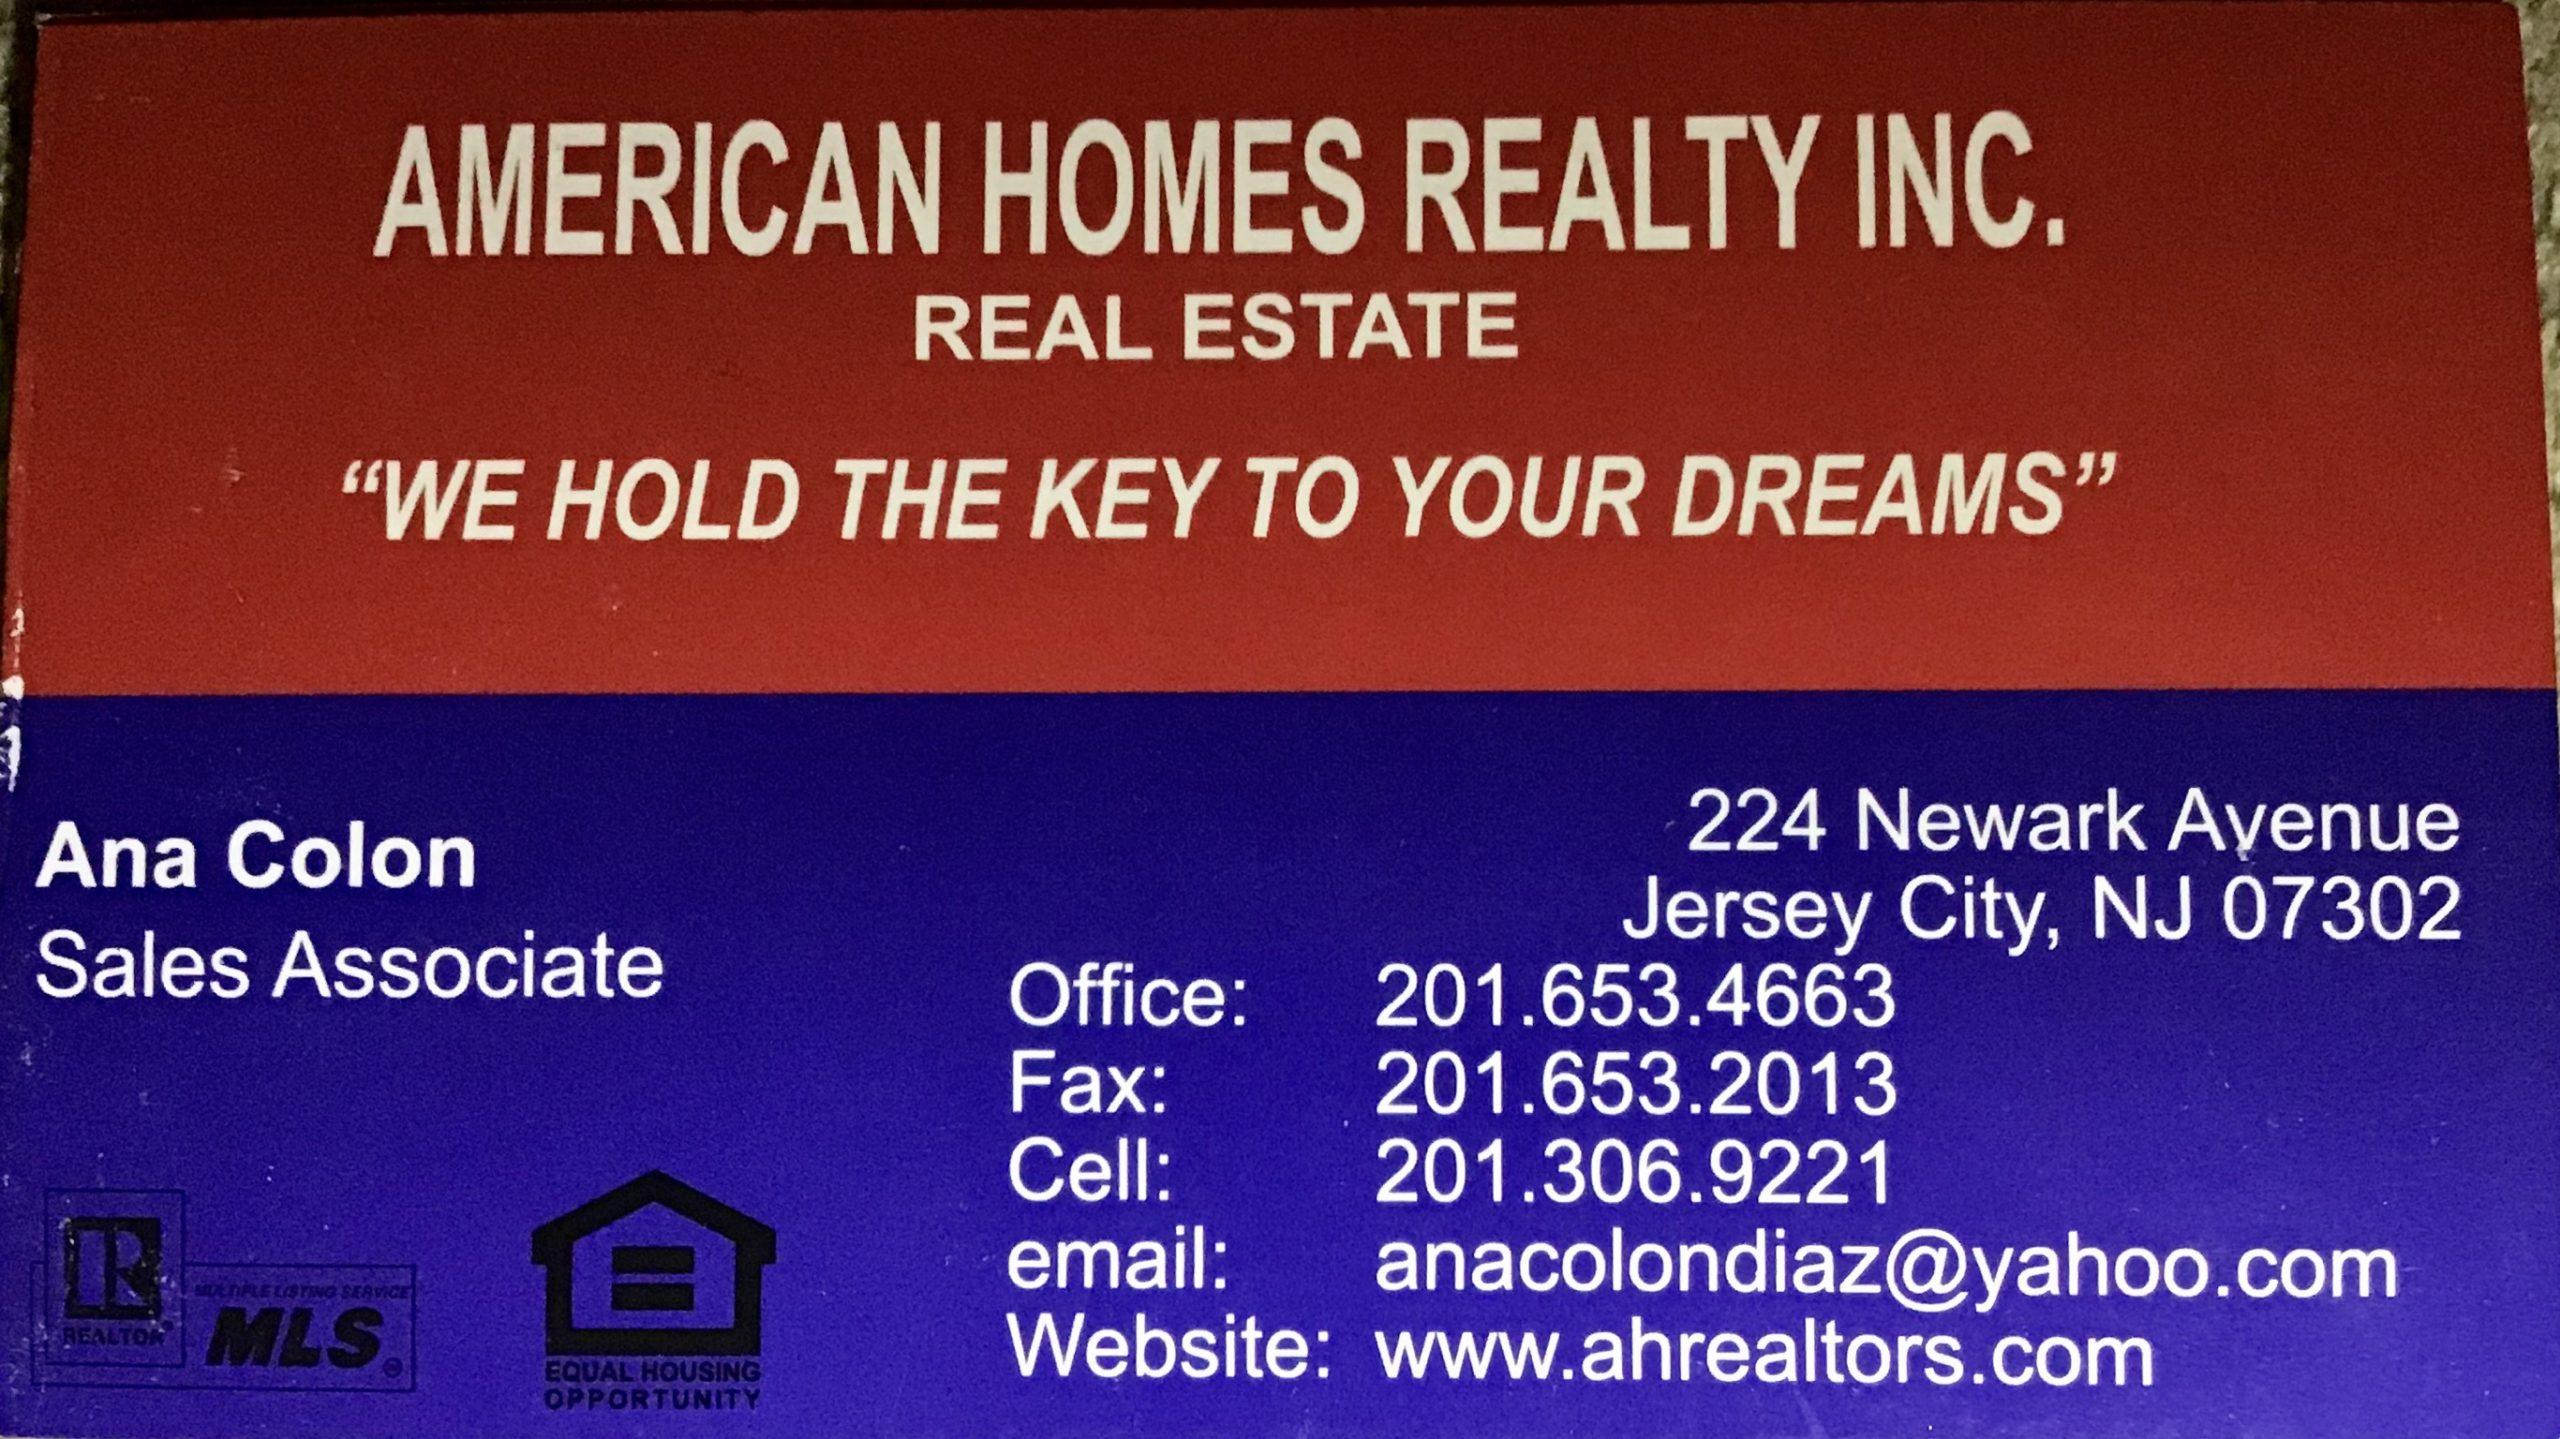 Ana-Colon-American-Homes-Realty